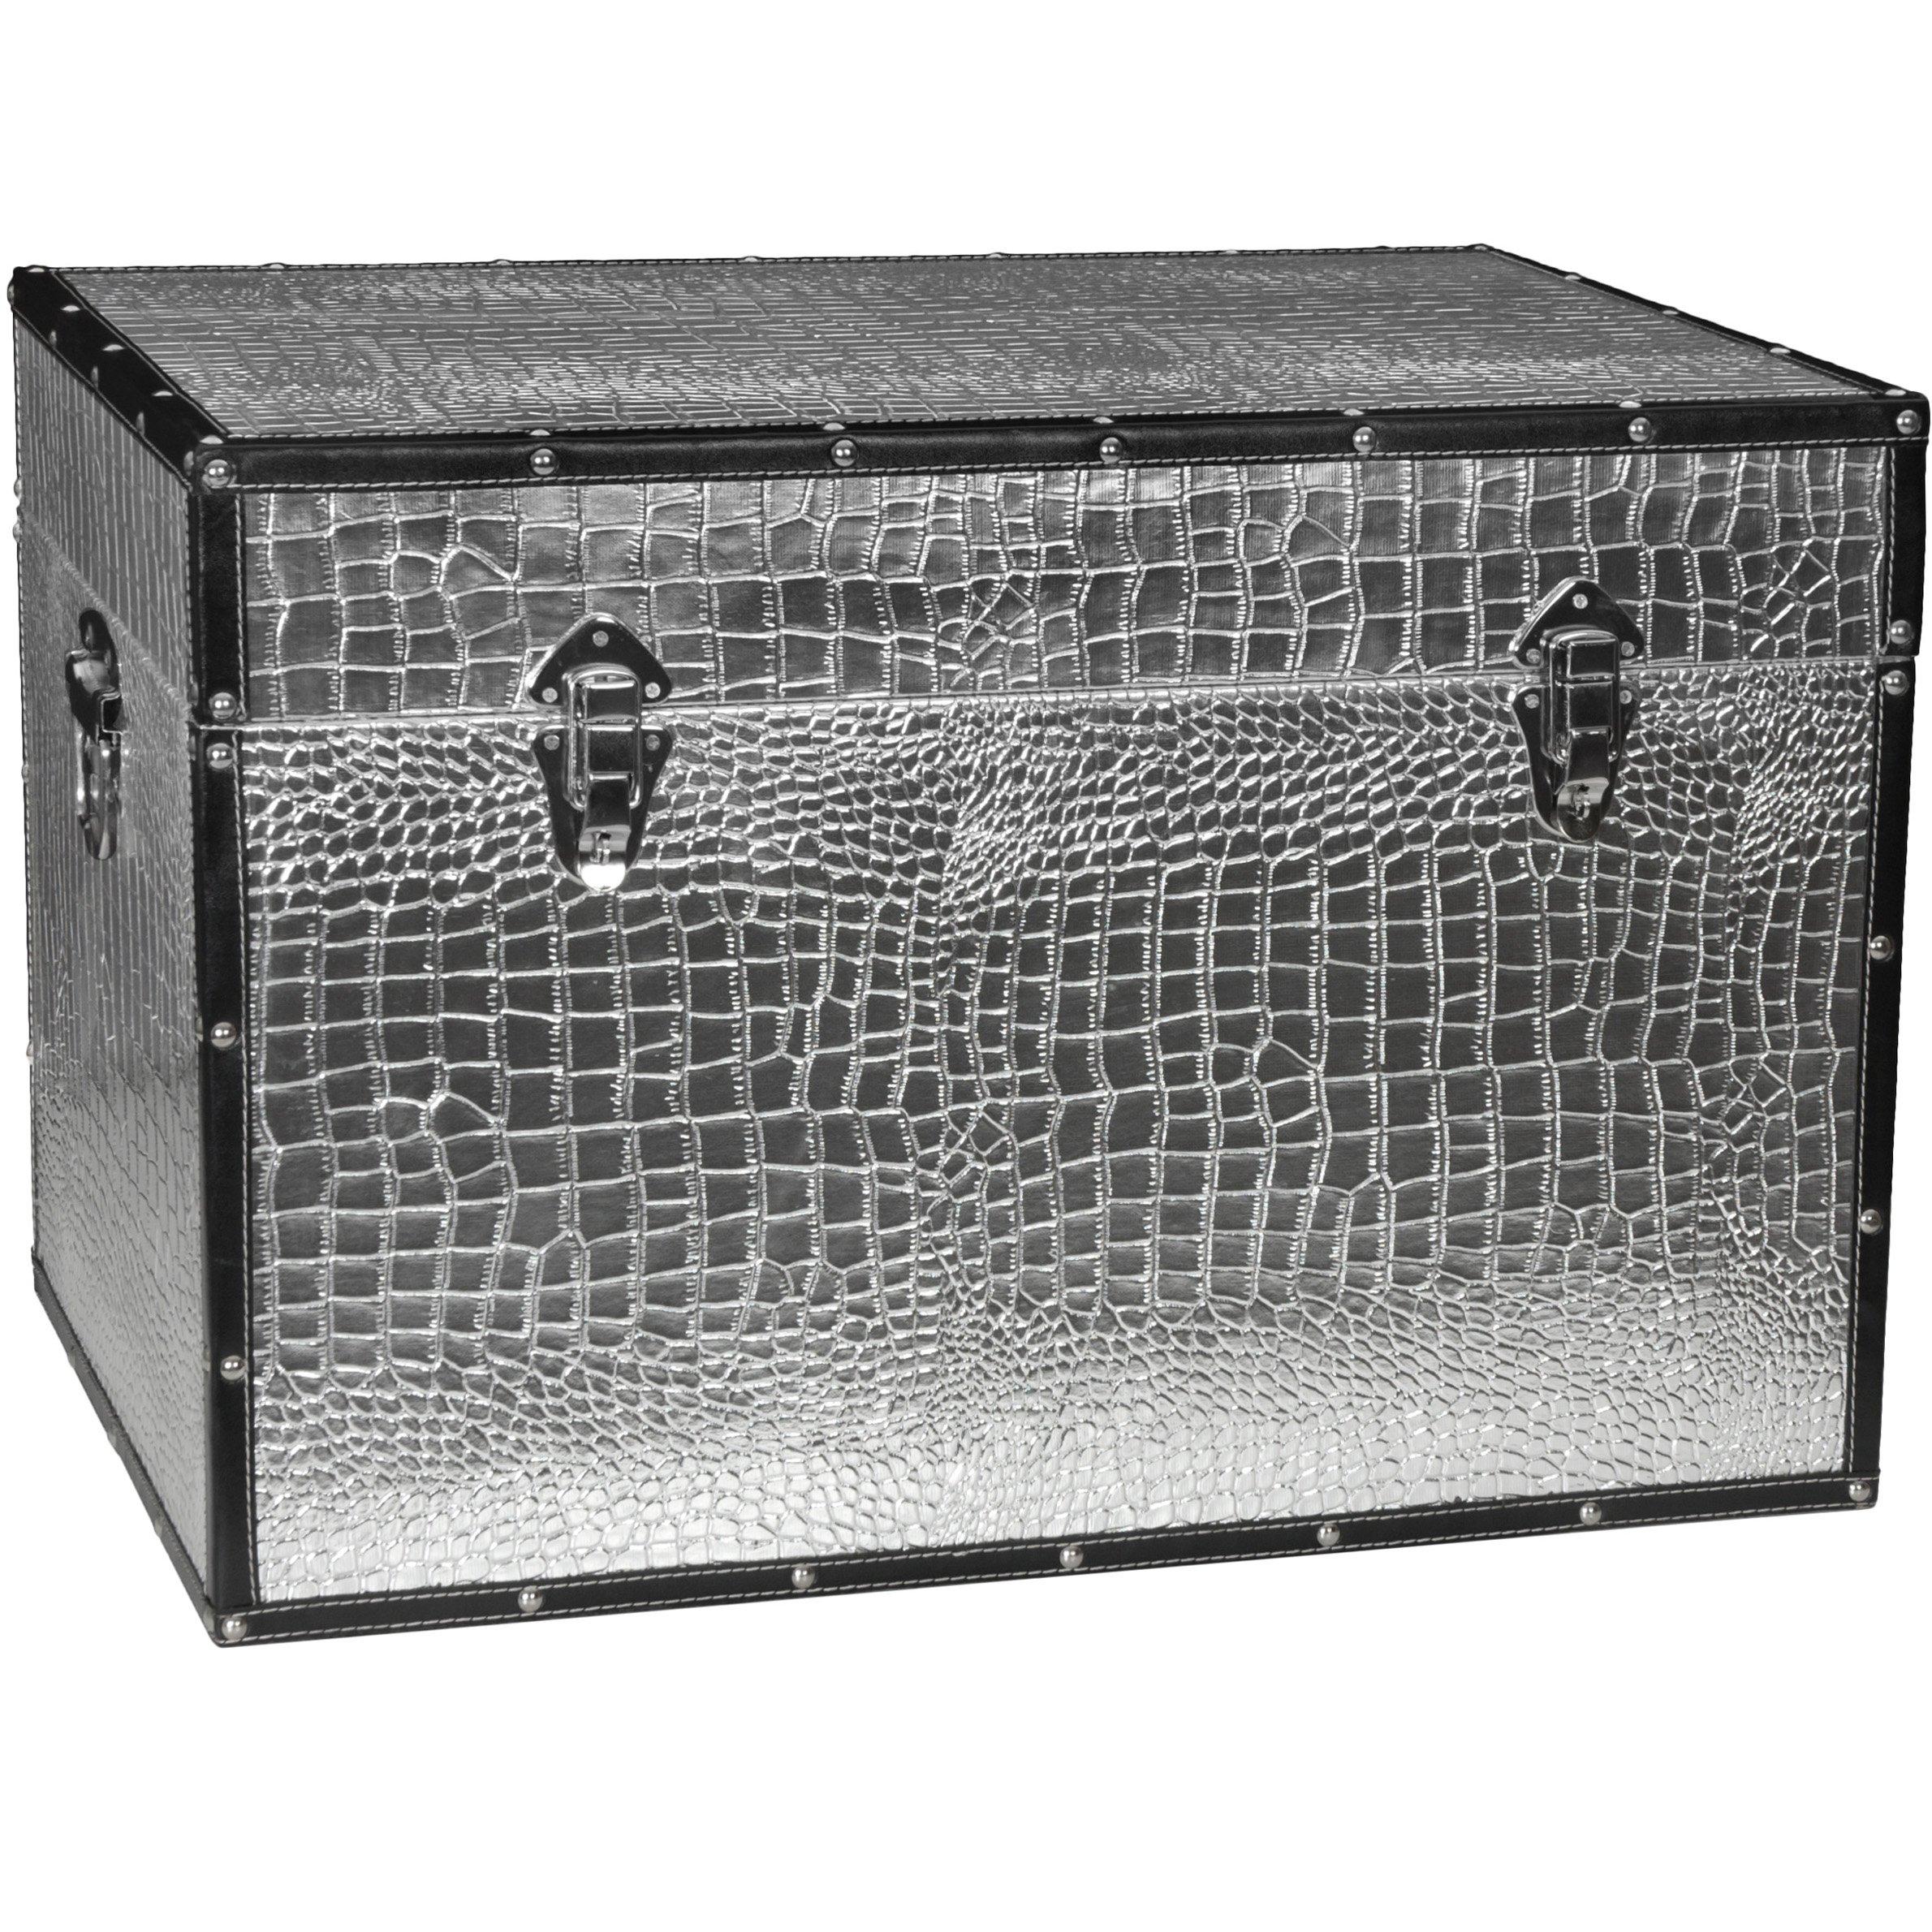 Oriental Furniture Faux Leather Silver Crocodile Trunk